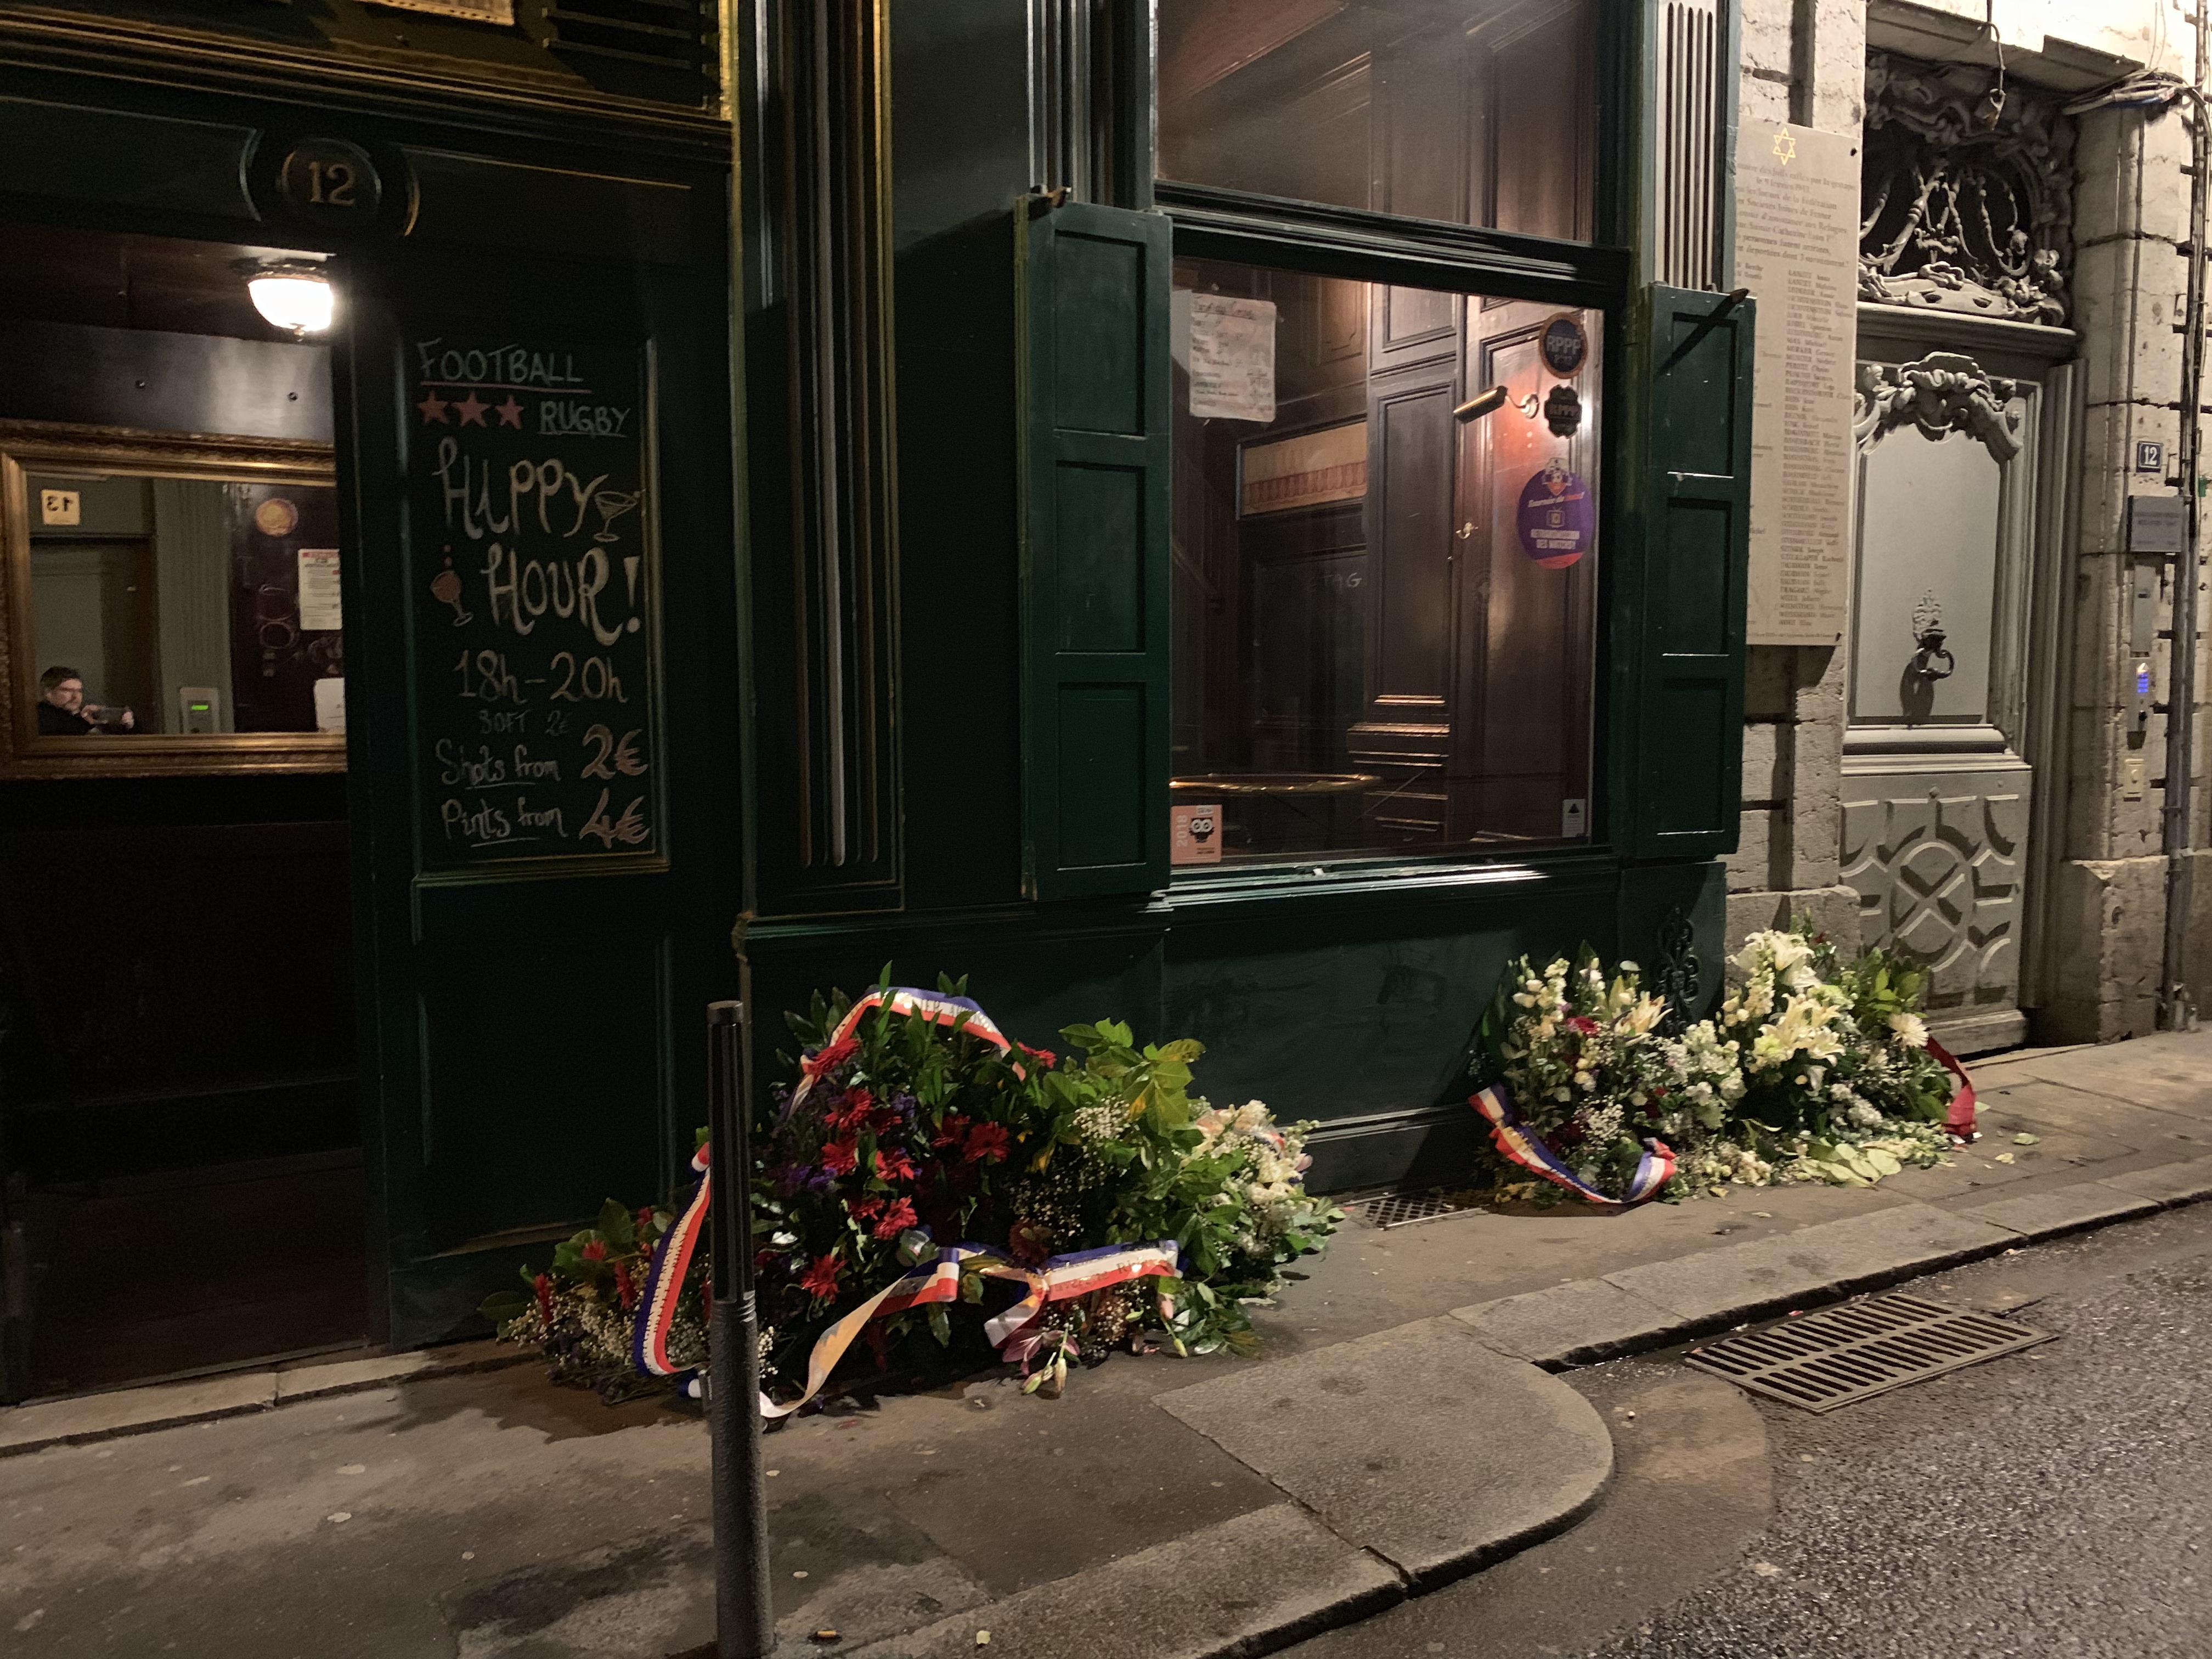 FileGerbes De Fleurs Au Pied La Plaque Commmorant Rafle Rue Sainte Catherine